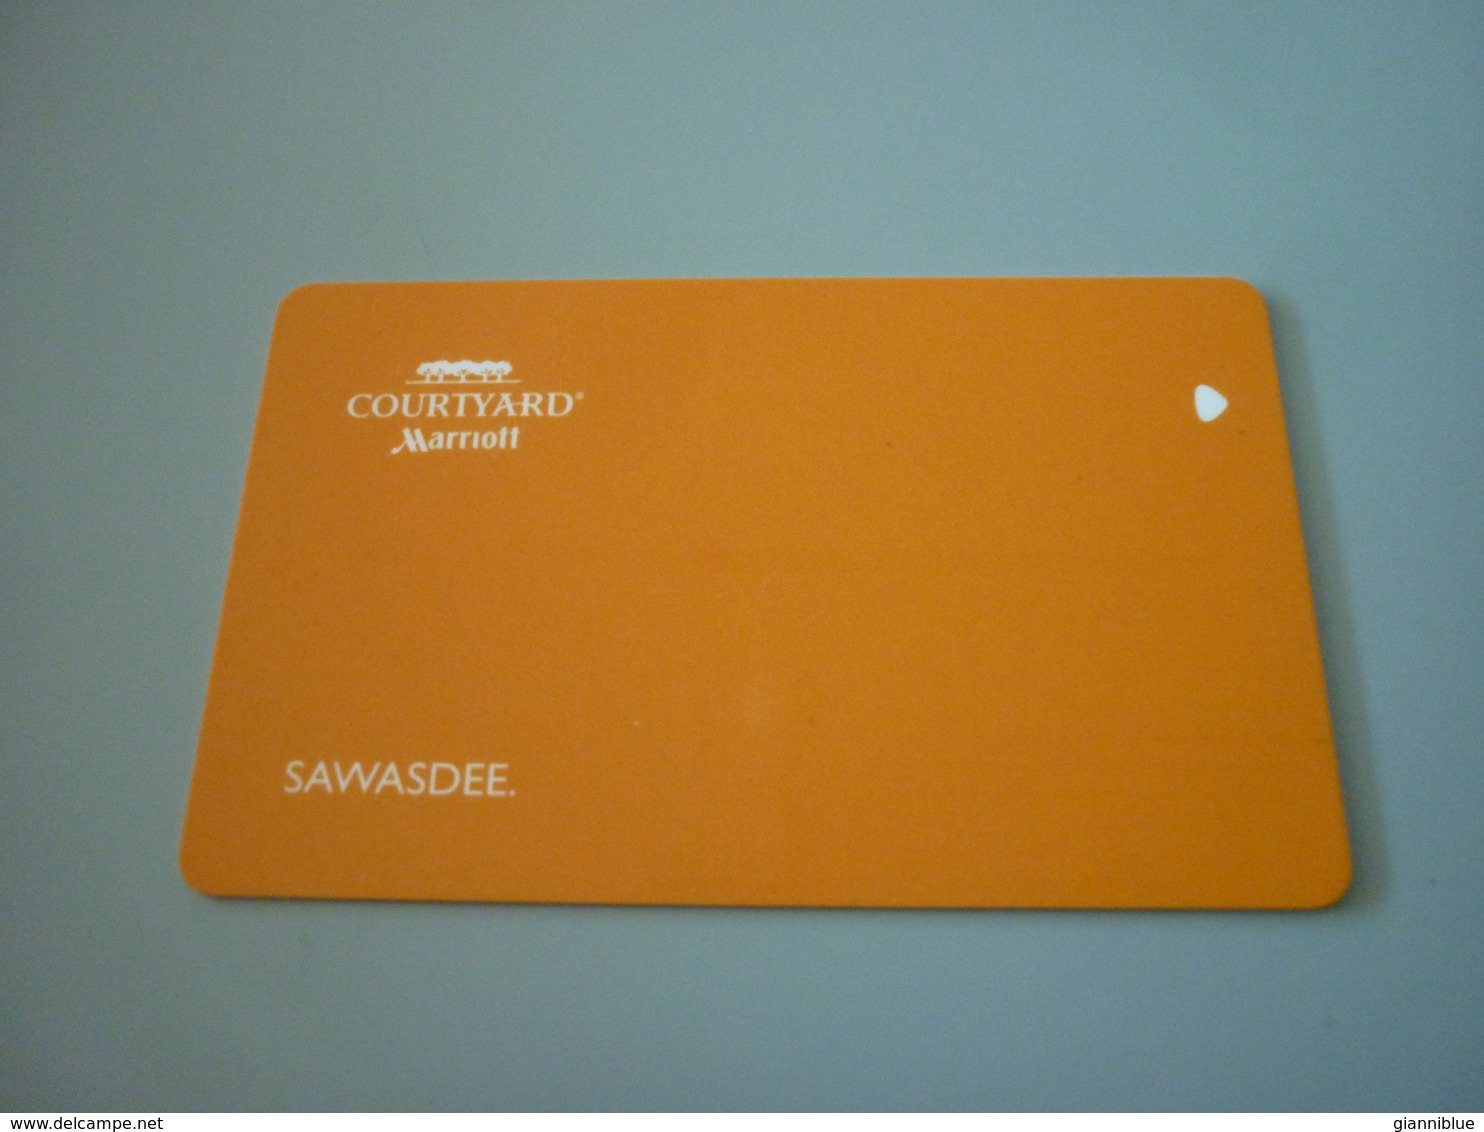 Thailand Sawasdee Courtyard Marriott Hotel Room Key Card - Cartes D'hotel